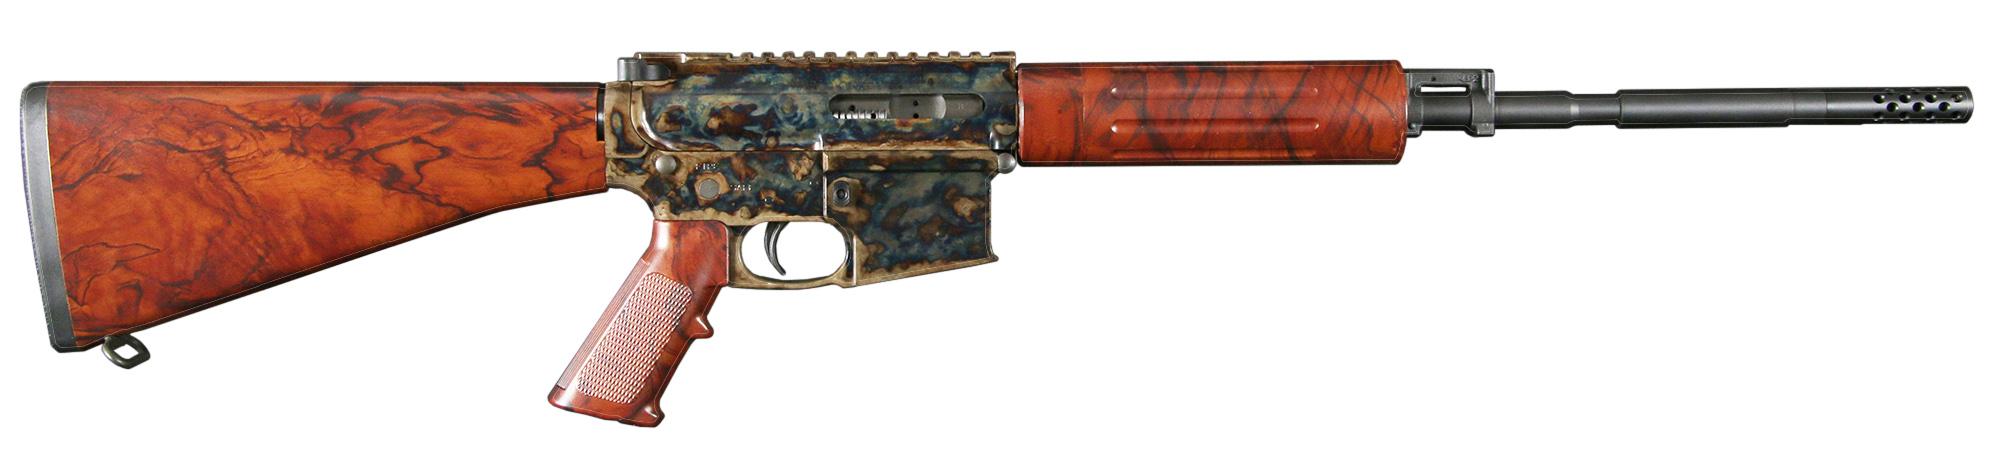 ar15 for varmint rifle archive saubier com